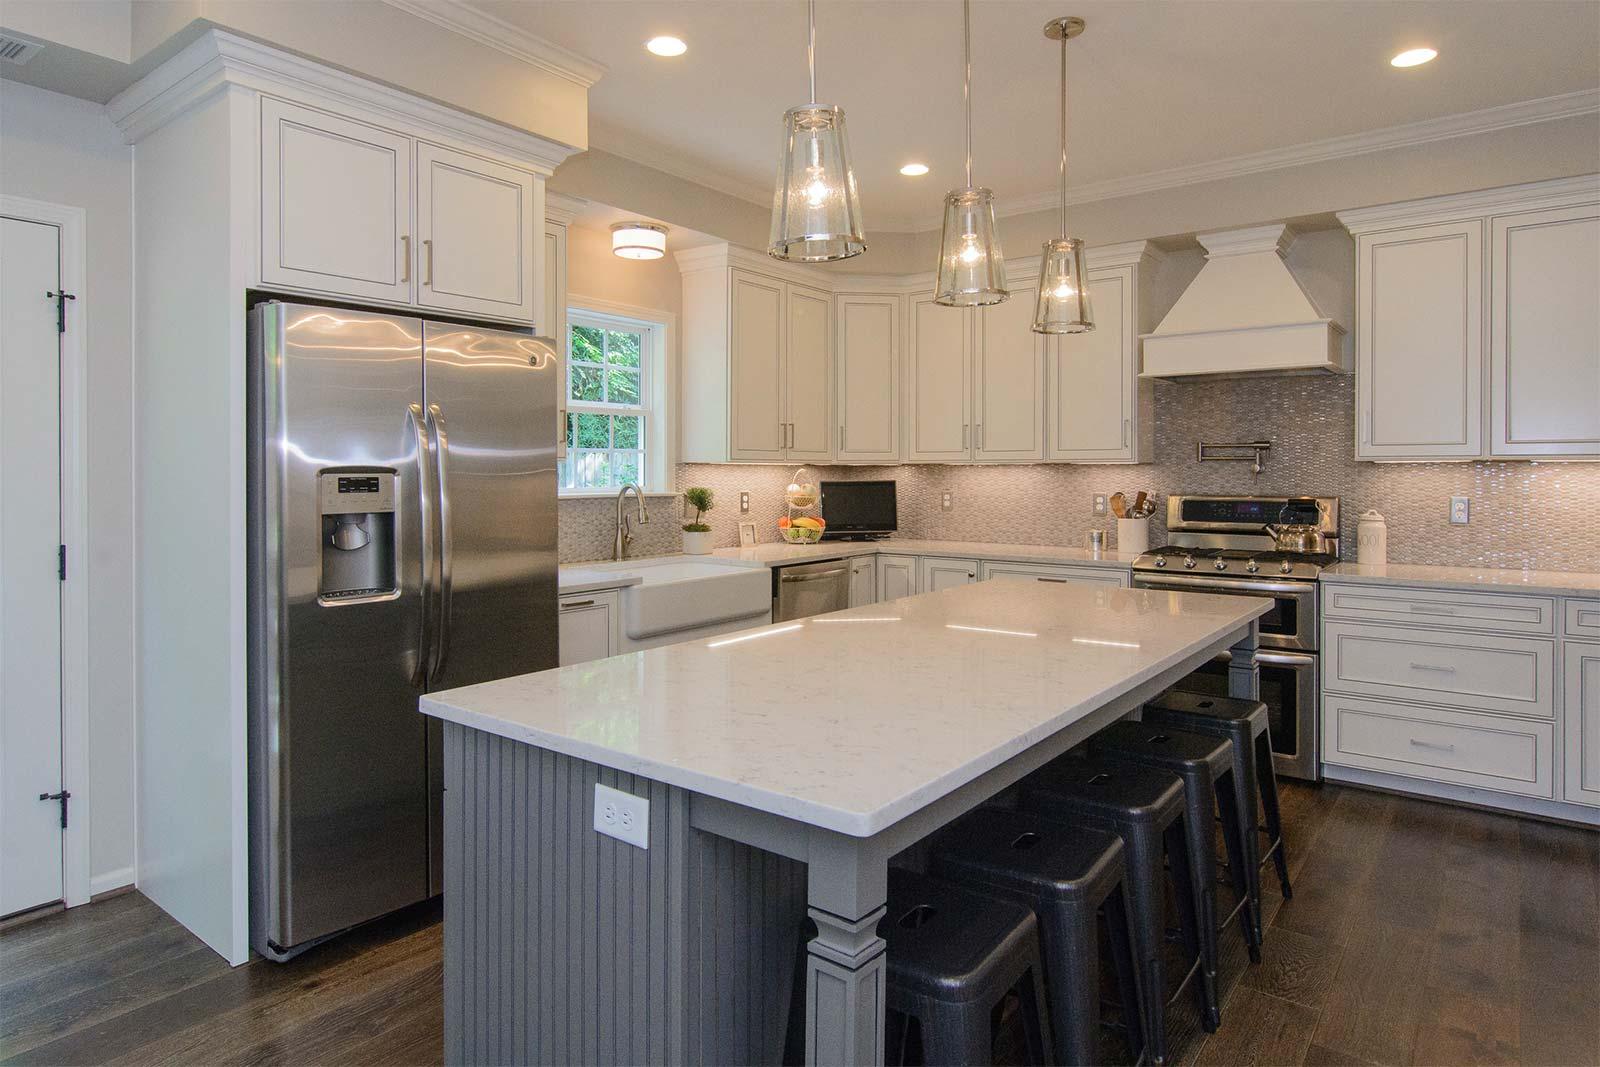 ambiant-lighting-in-kitchen.jpg